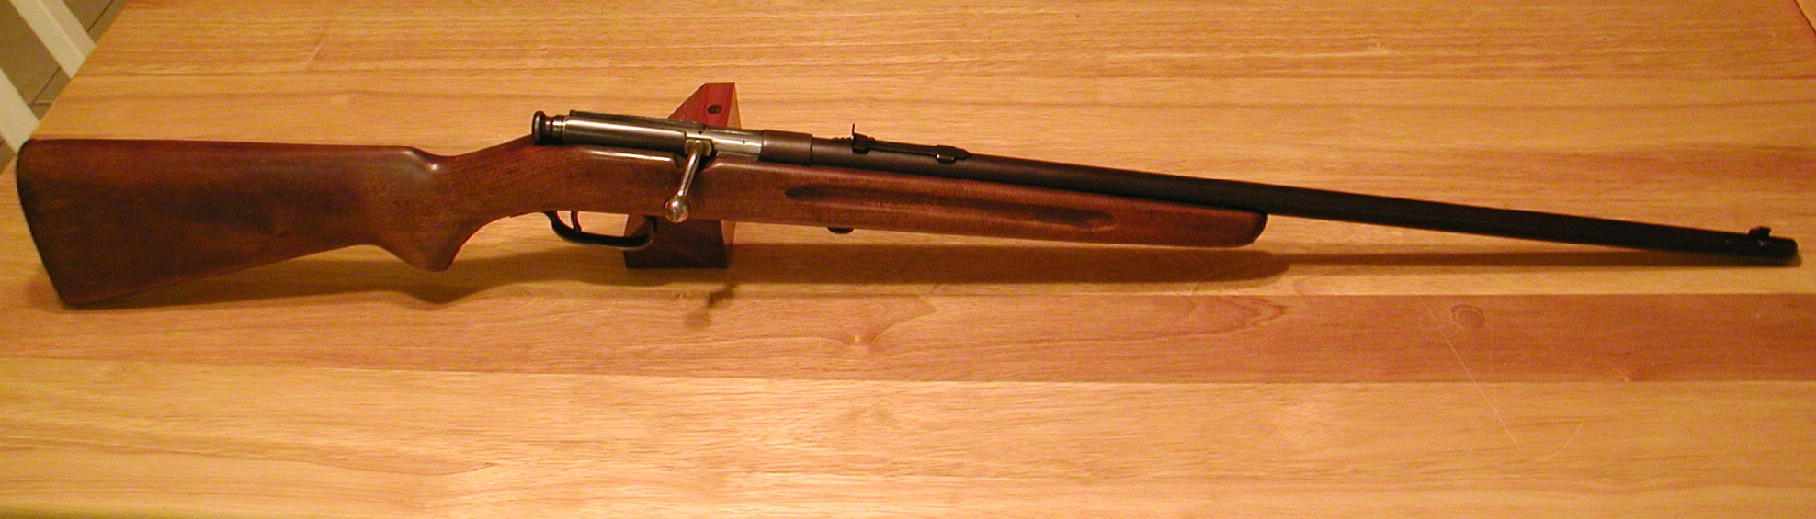 Oldest gun owned?-22sp.jpg